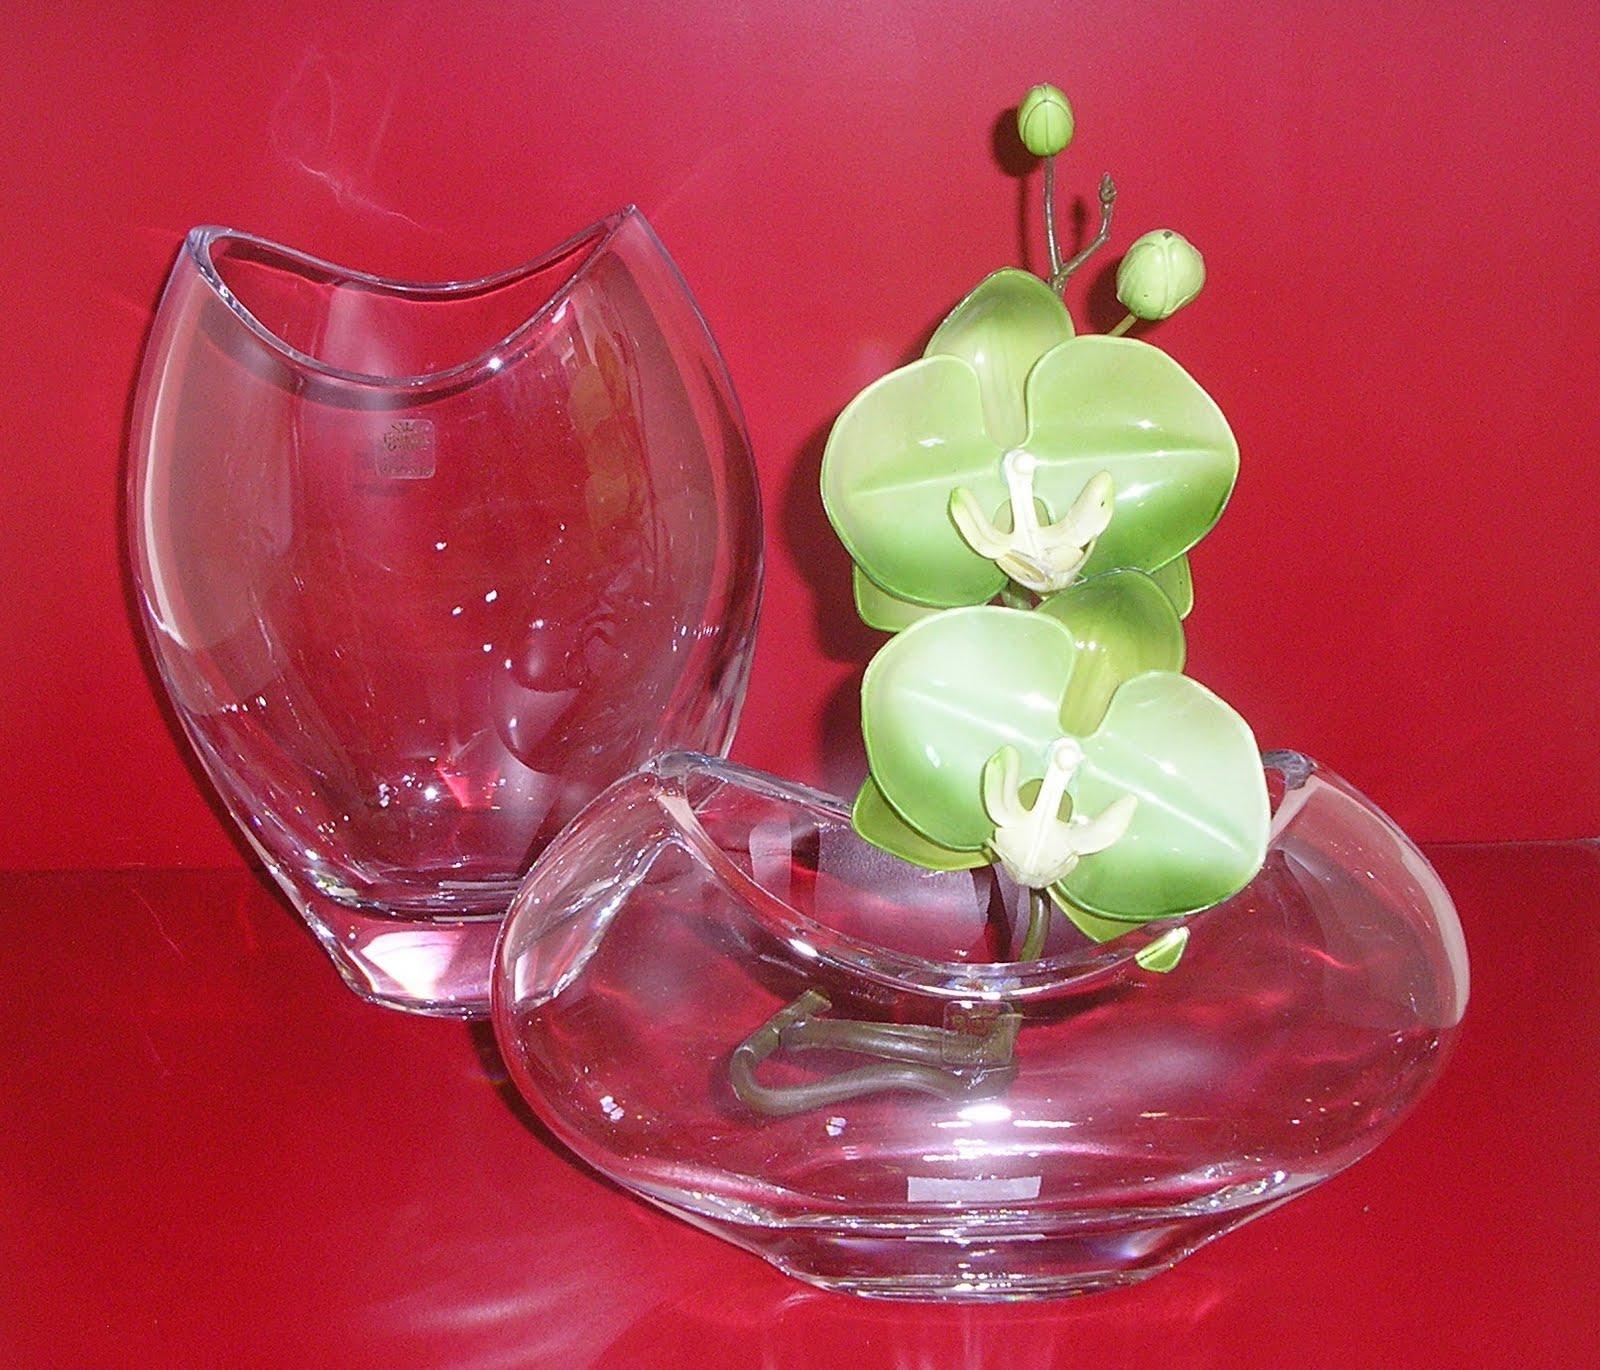 Vasi arredamento moderno free vaso ornamentale in for Vasi arredo soggiorno